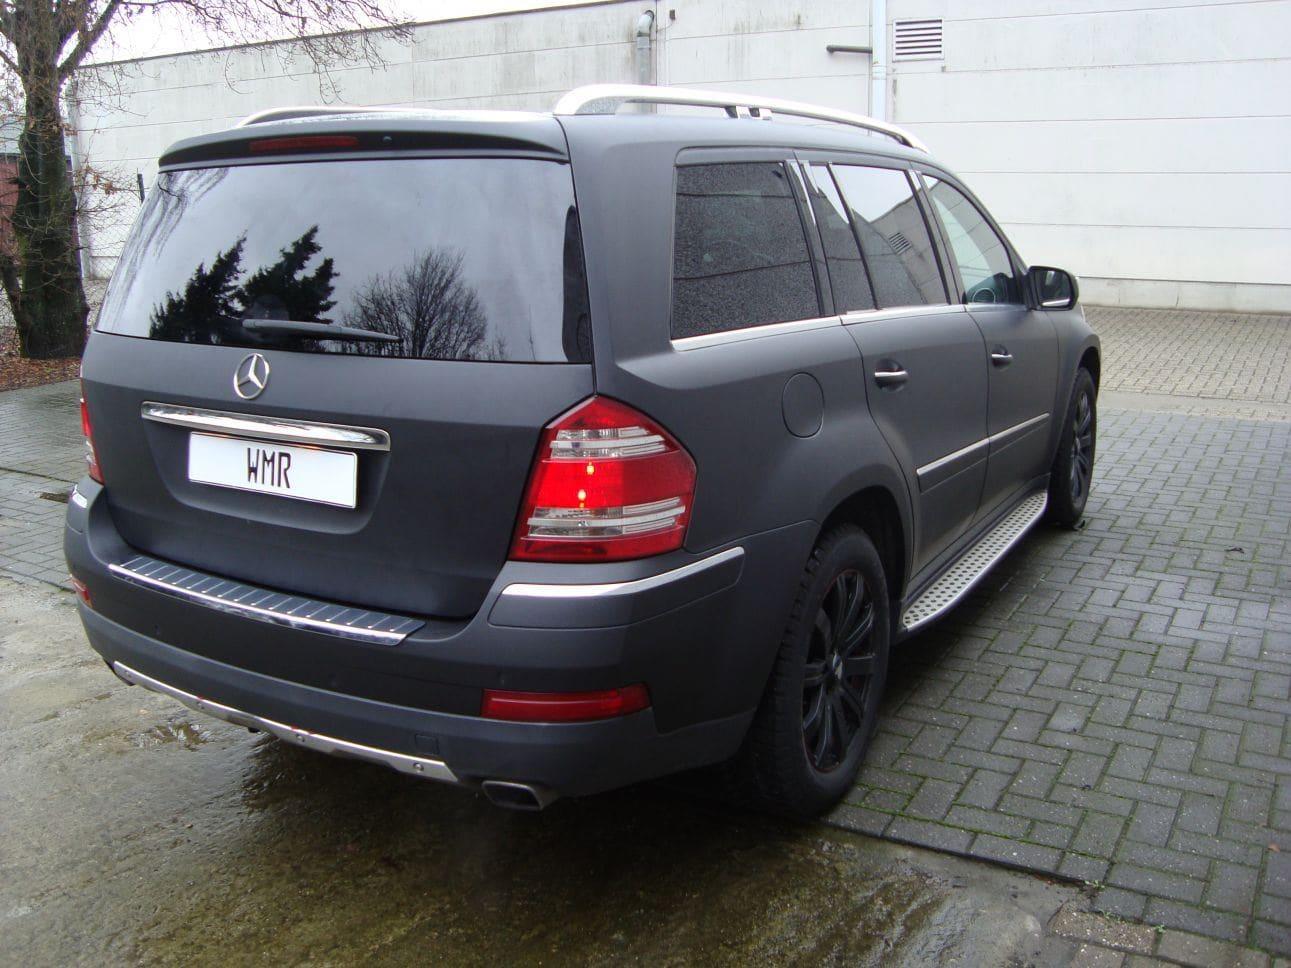 Mercedes GL met Mat Zwarte Wrap, Carwrapping door Wrapmyride.nu Foto-nr:6290, ©2021